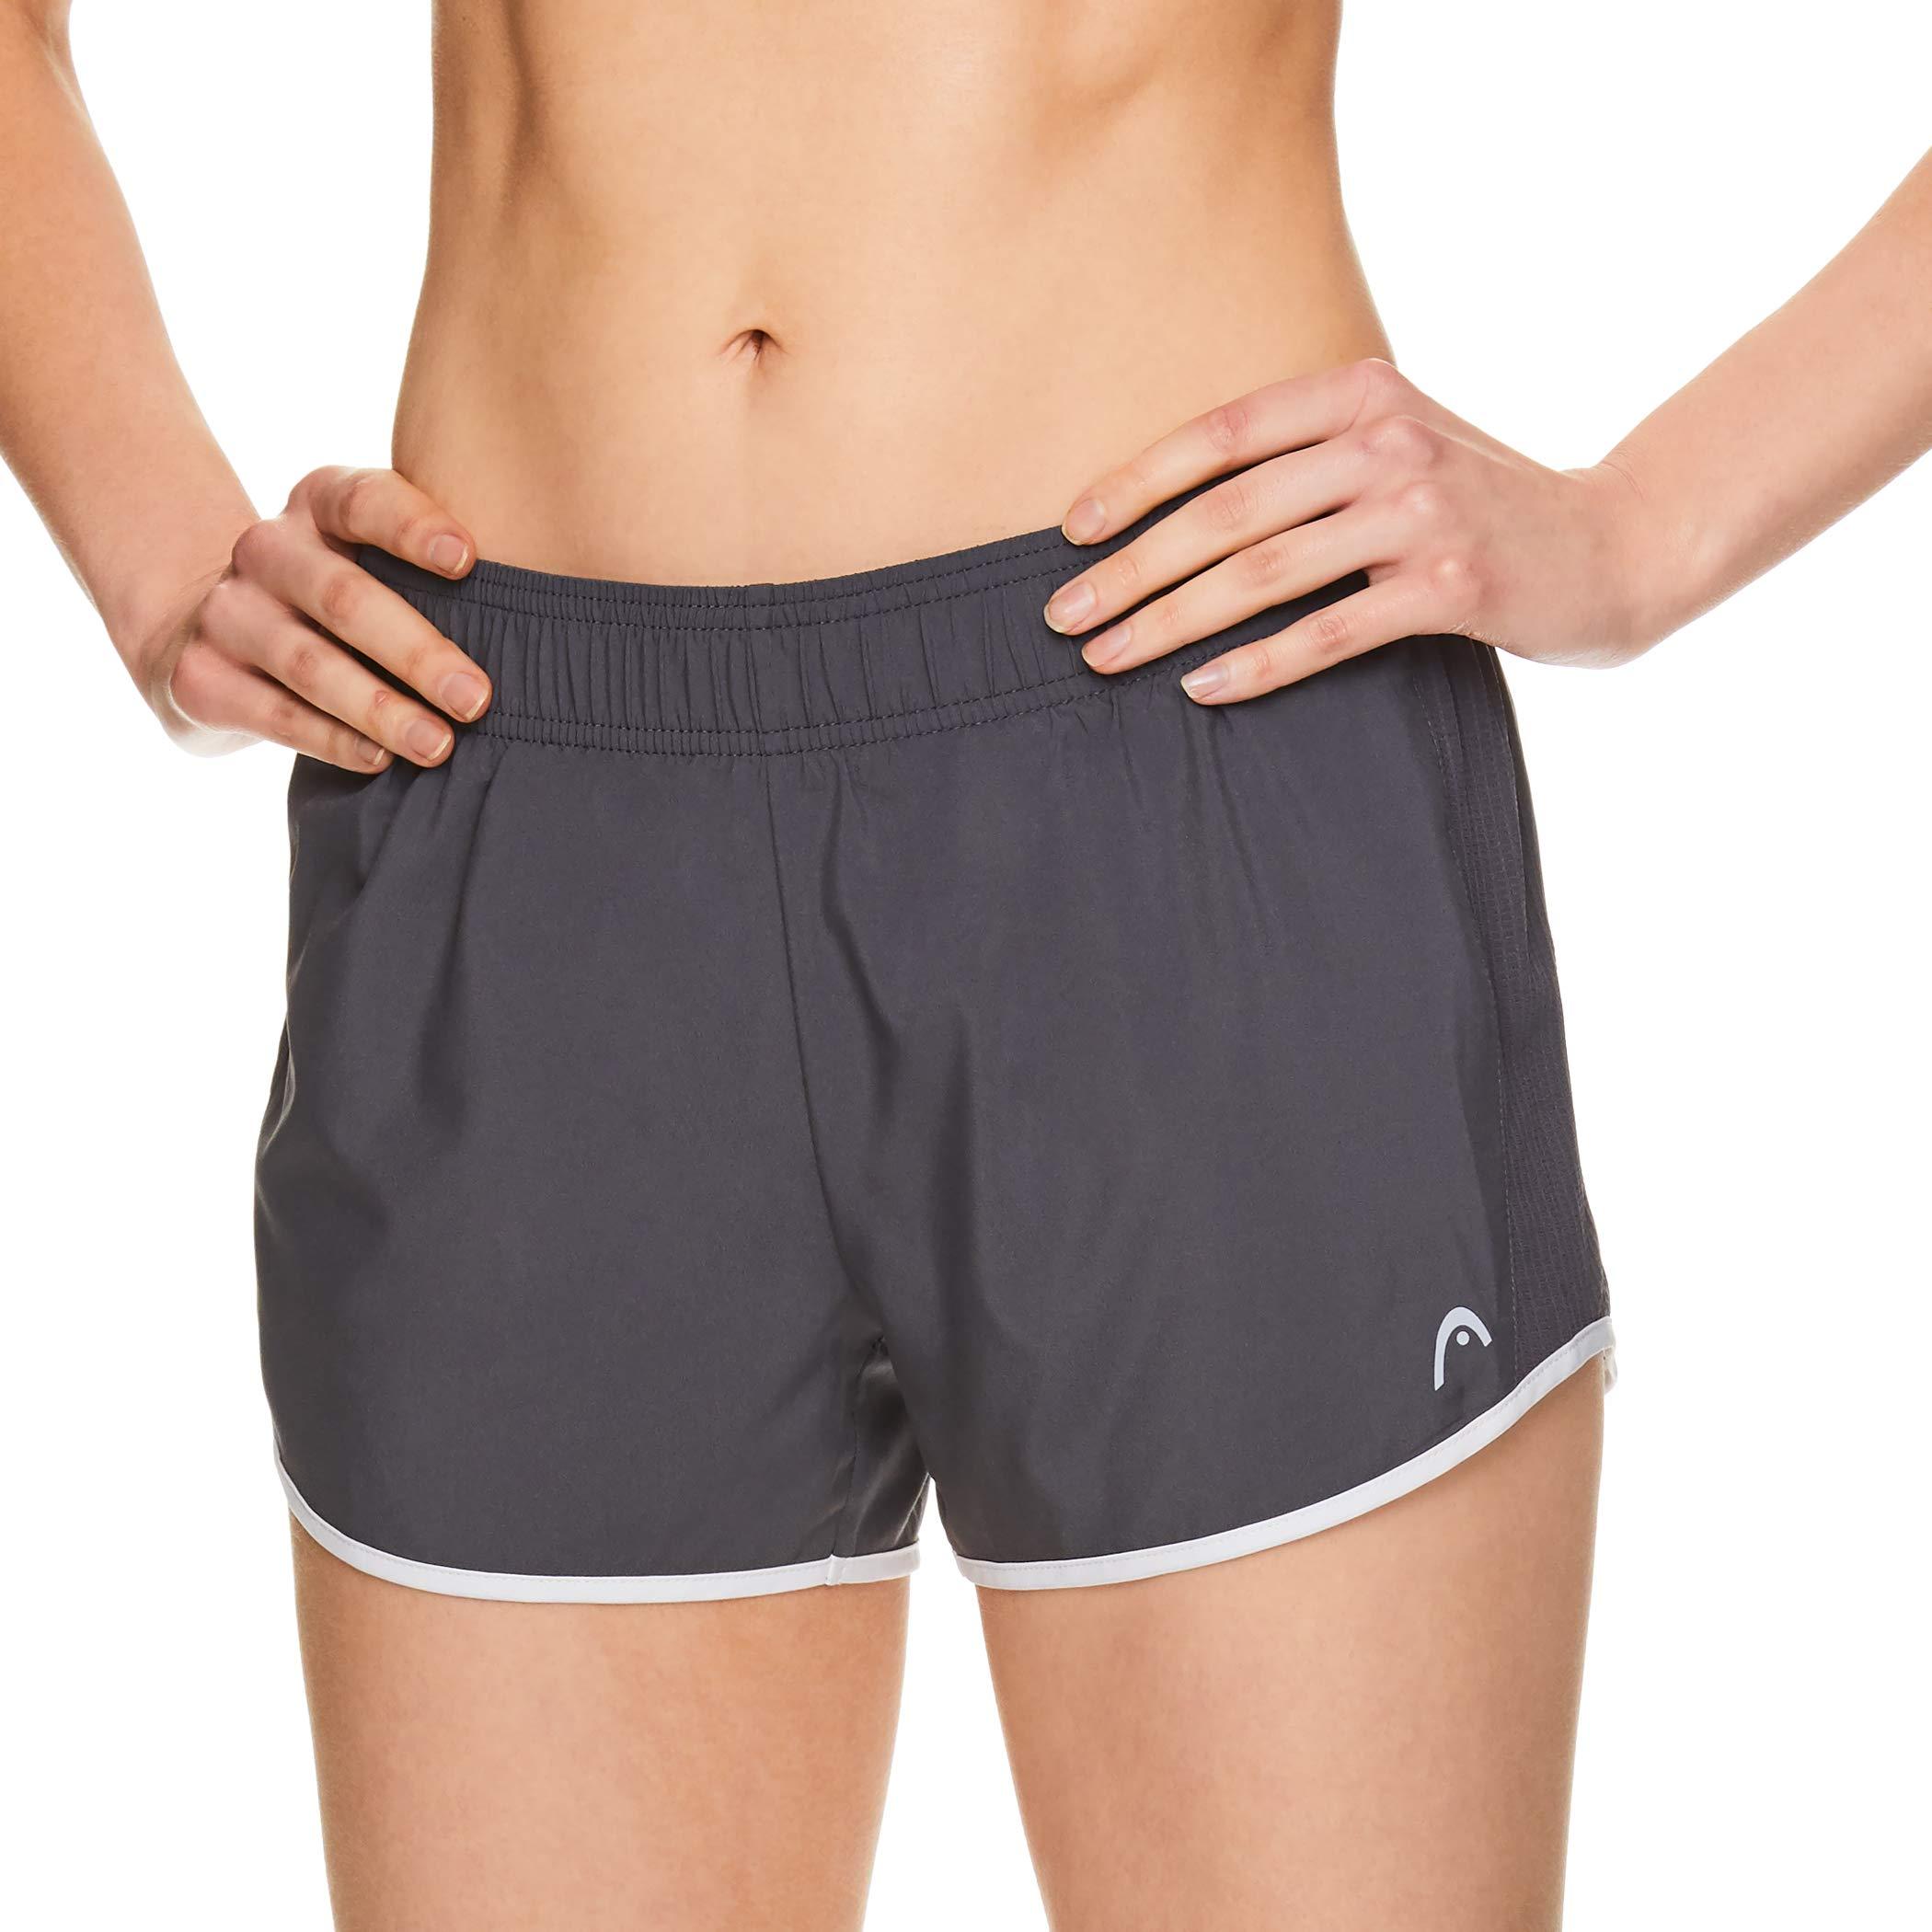 HEAD Women's Athletic Workout Shorts - Polyester Gym Training & Running Short - Ally Medium Grey, X-Small